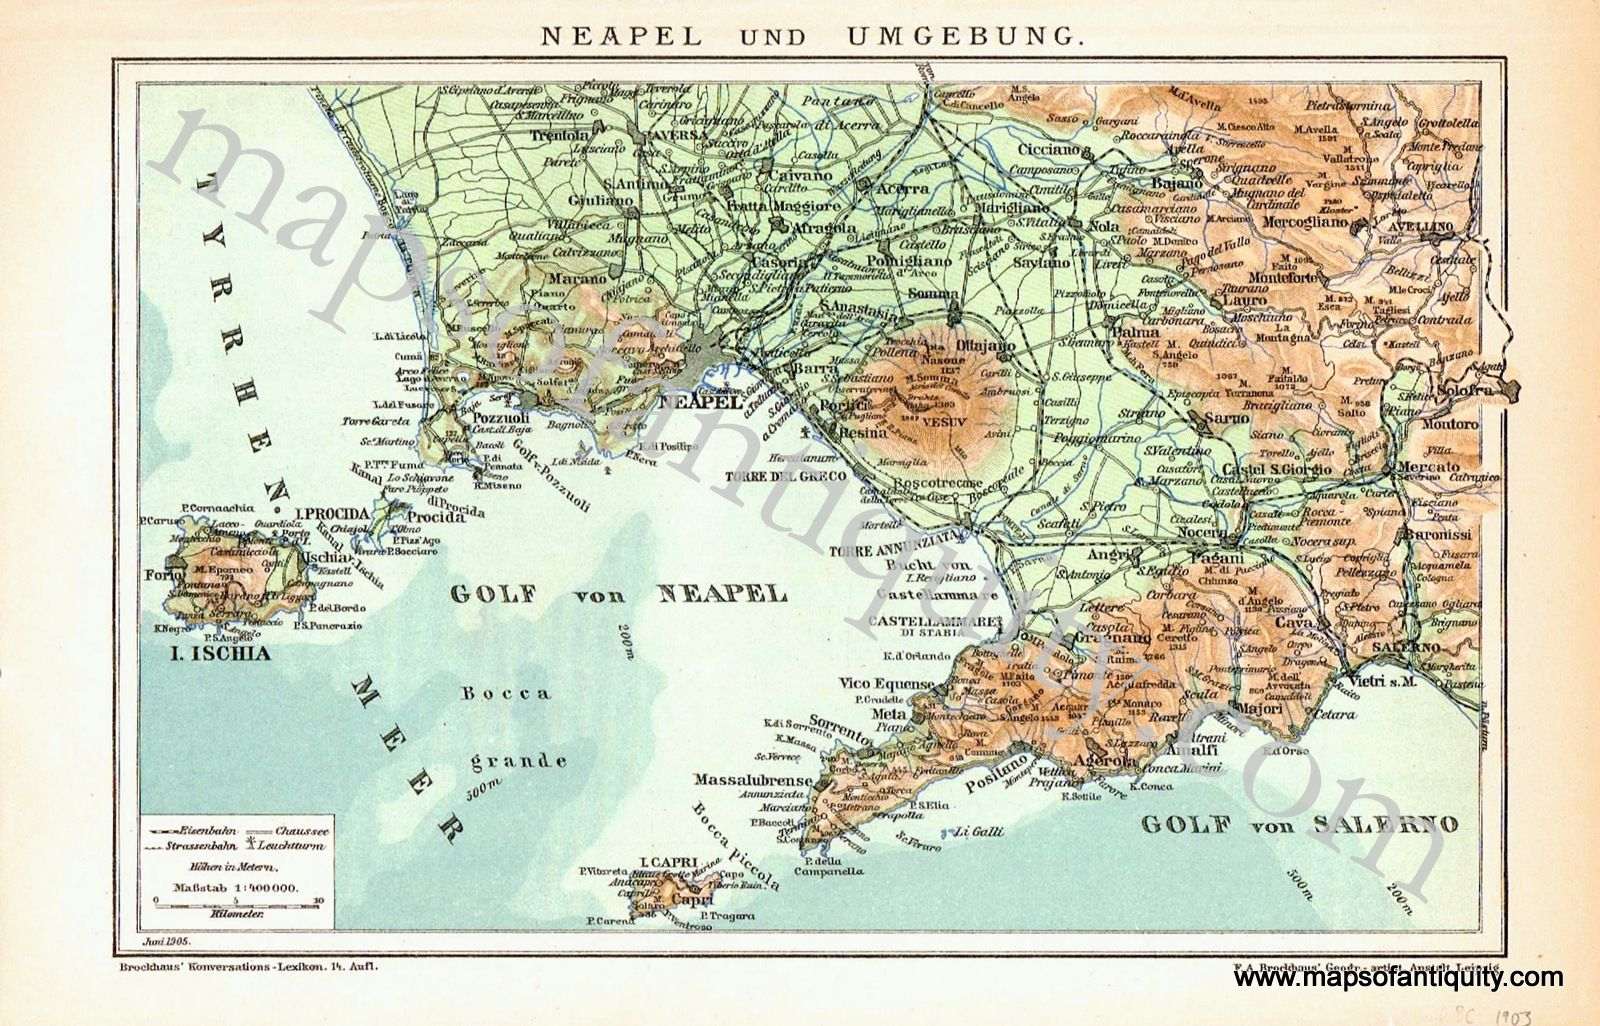 Bay of Naples & Naples Italy Neapel und Umgebung Antique Maps